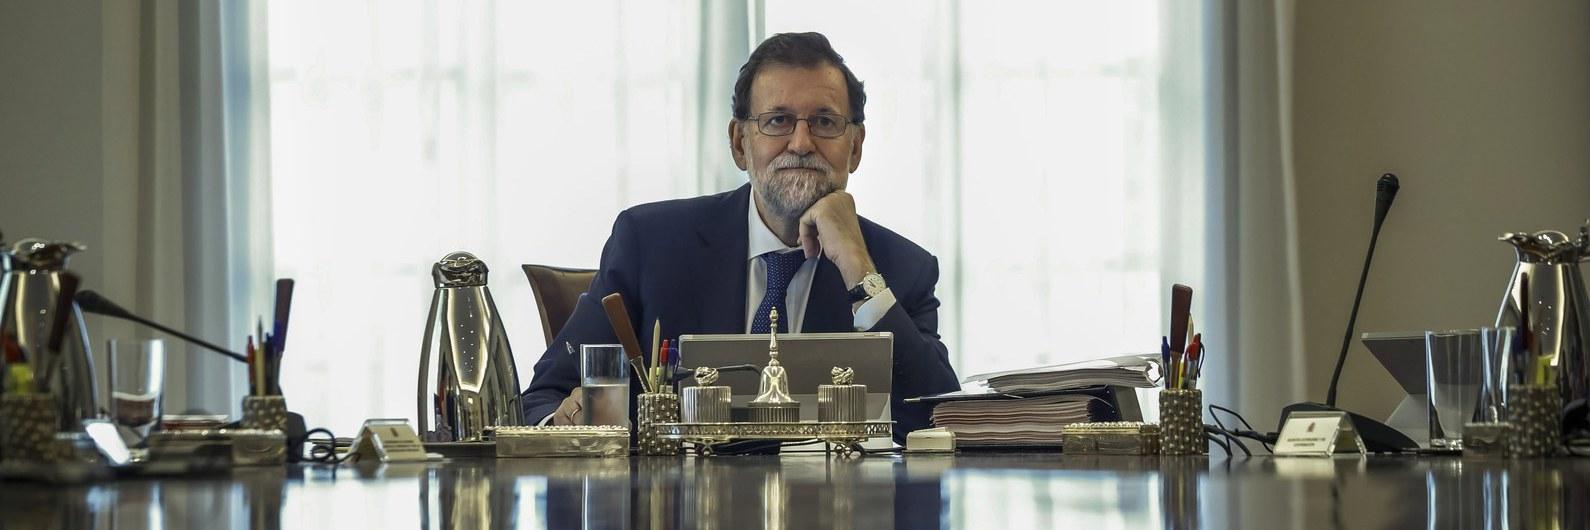 "Catalunha. Rajoy acusado de ser o ""guardião do túmulo"" de Franco"